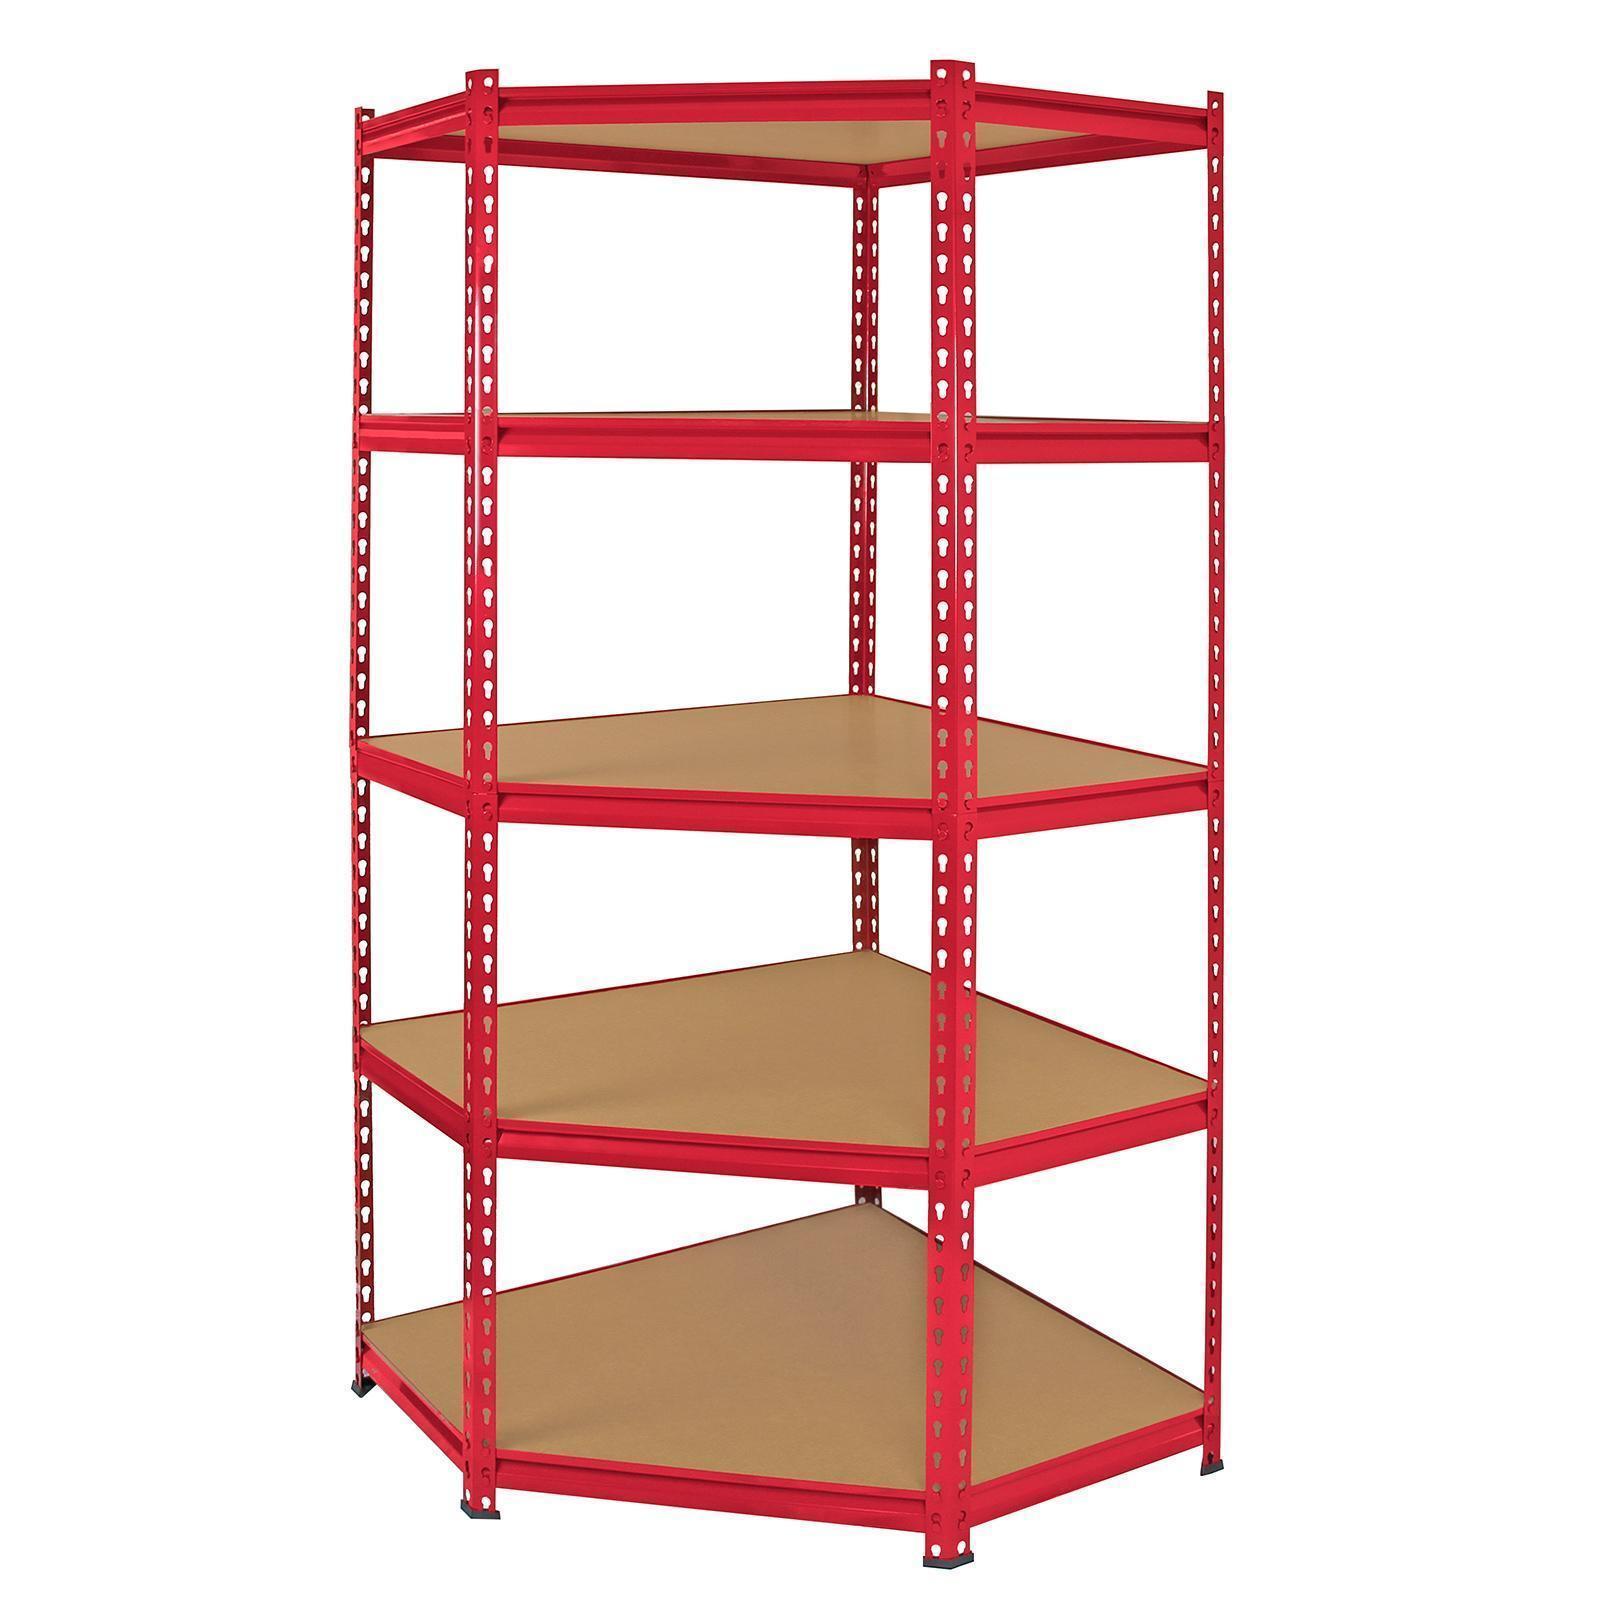 5 Tier Shelf Shelving Unit Racking Heavy Duty Storage Shelves Red